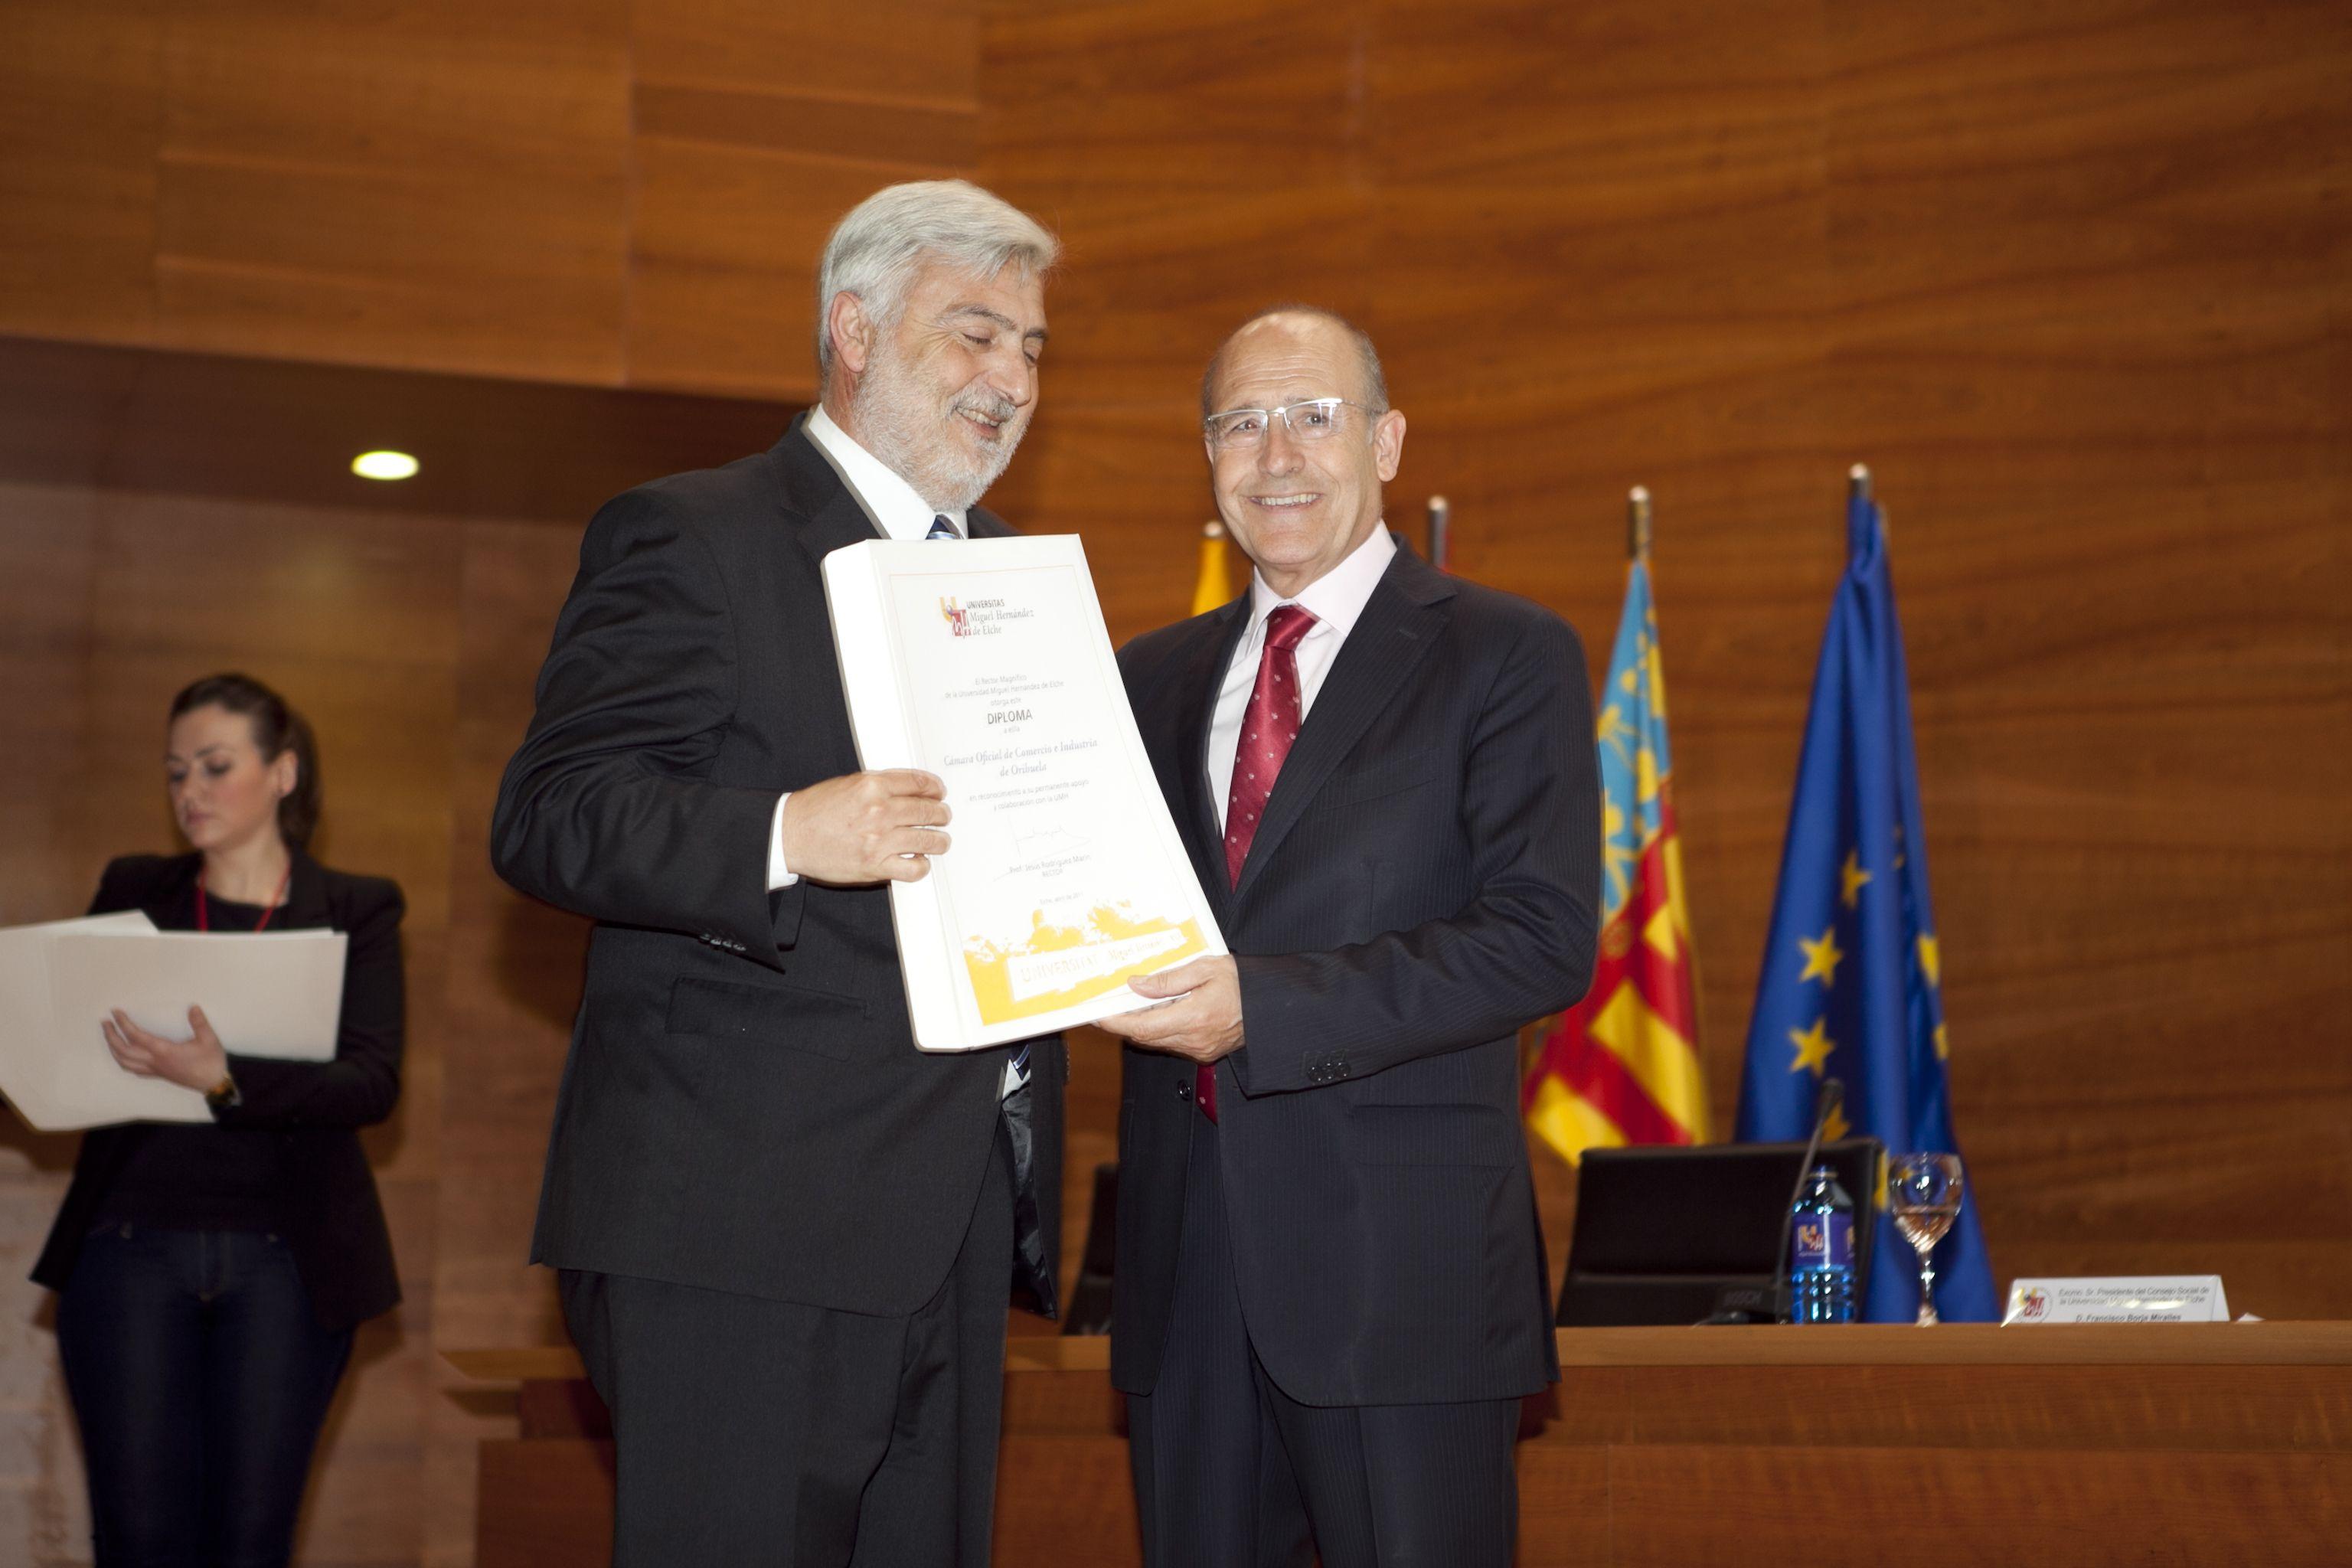 umh-diplomas-rector_mg_6984.jpg